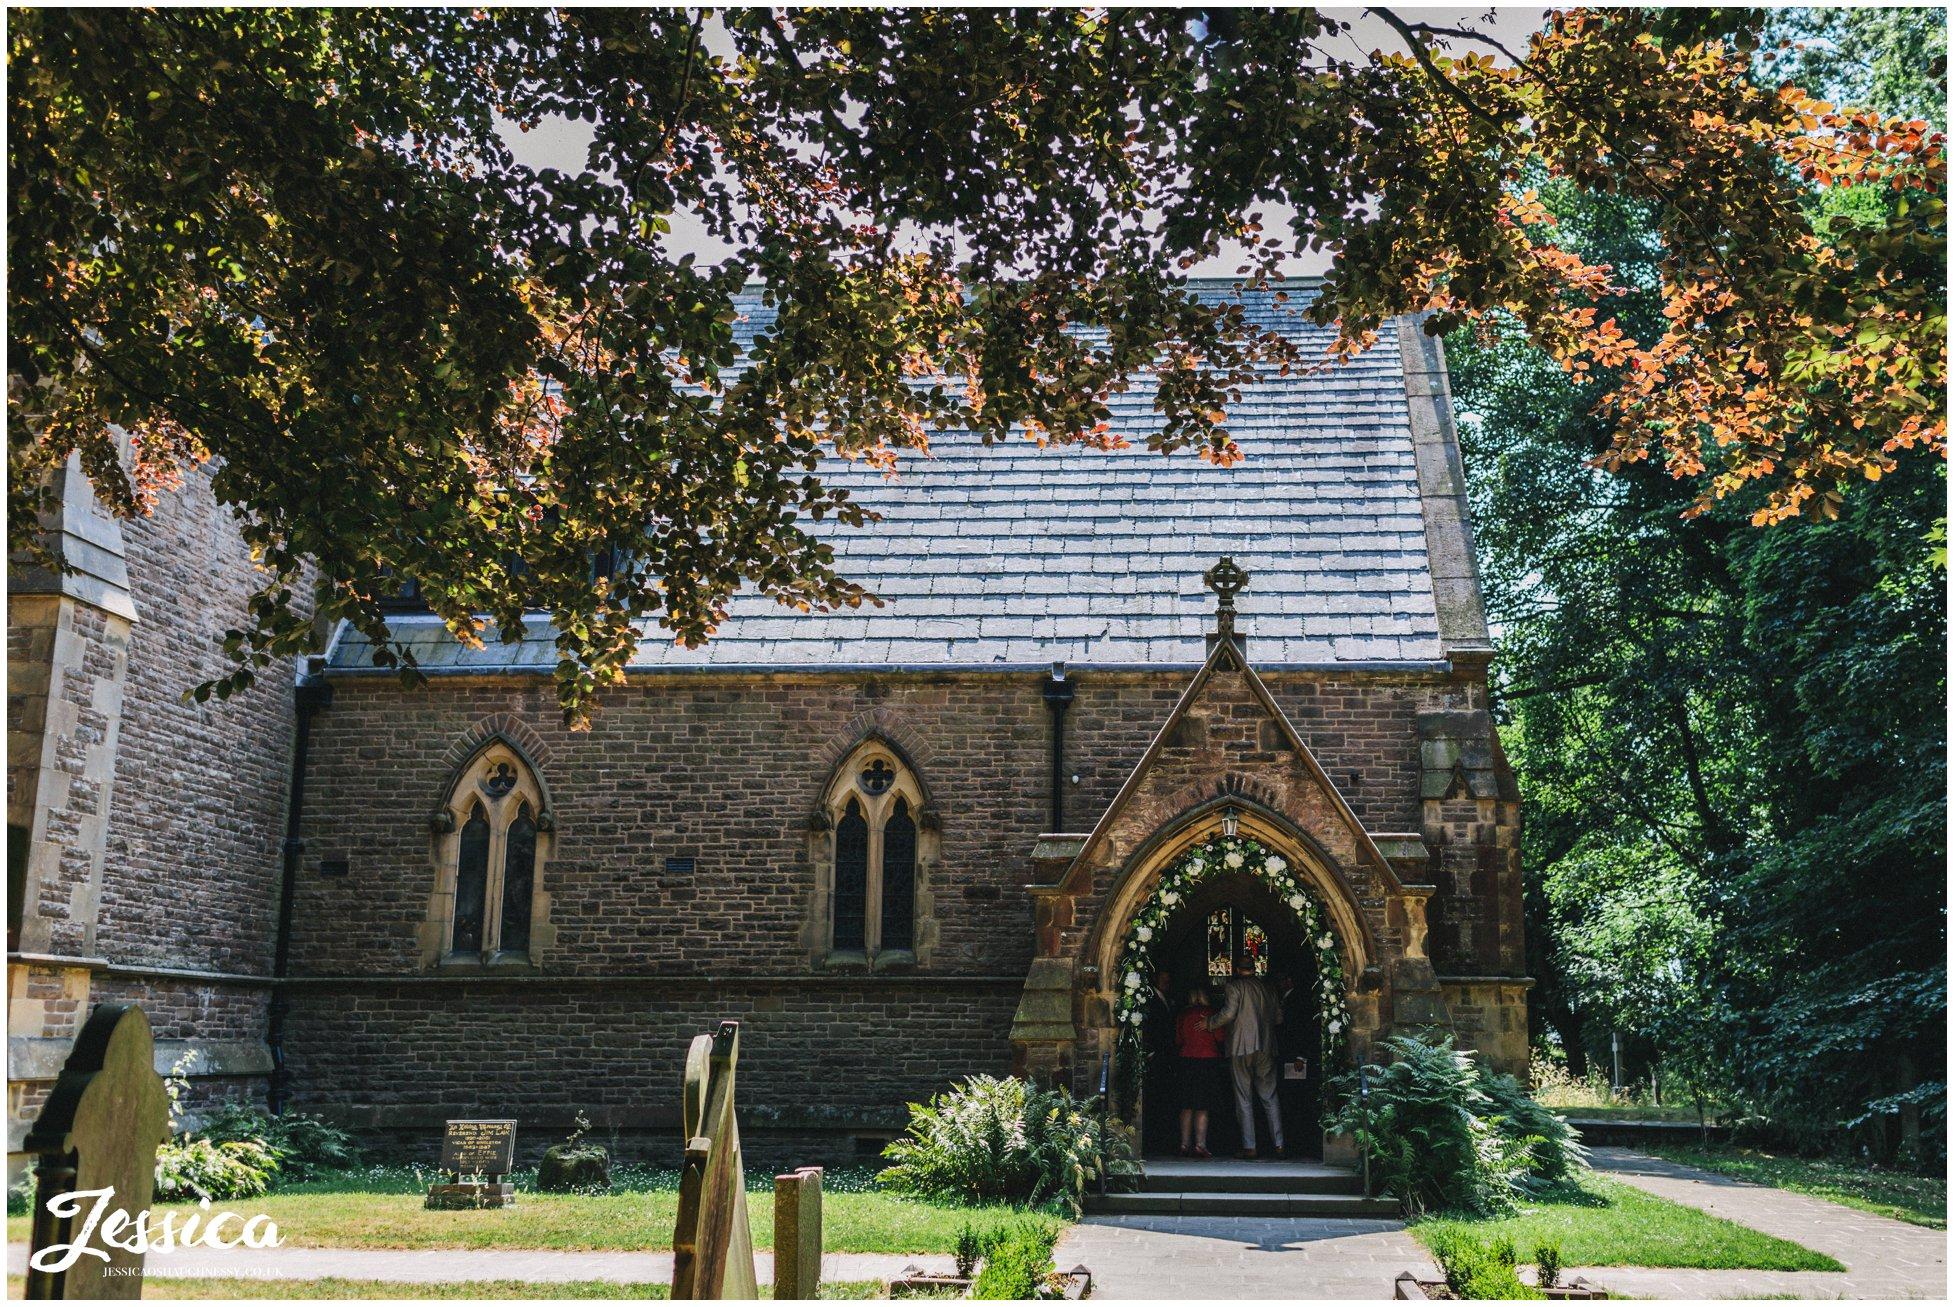 St Annes church in Singleton, Lancashire